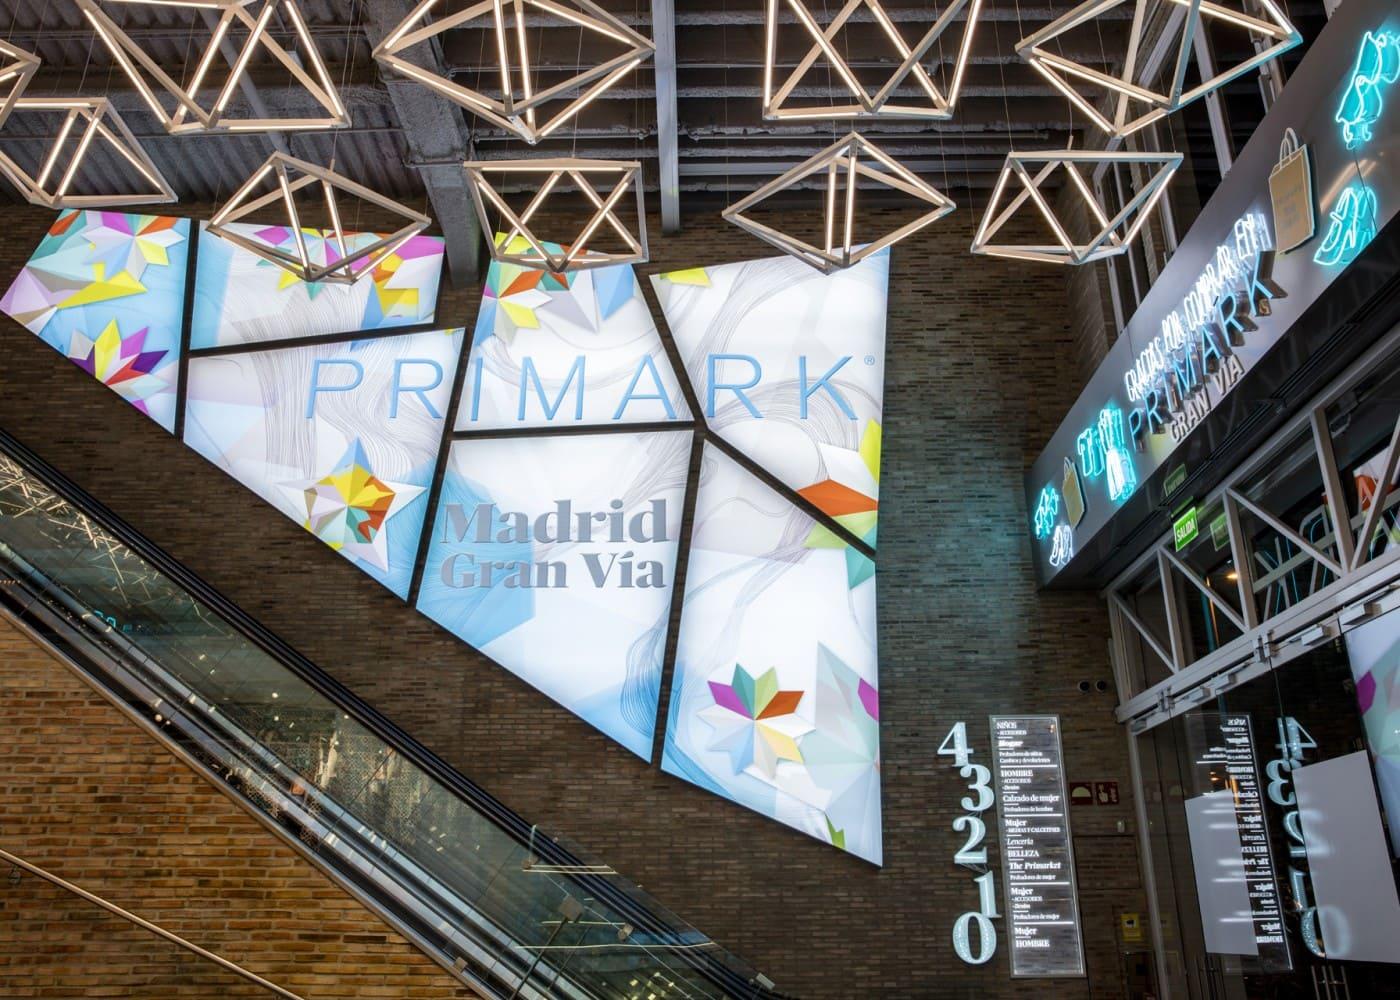 retail lighting design: Primark Madrid Gran Via wall display